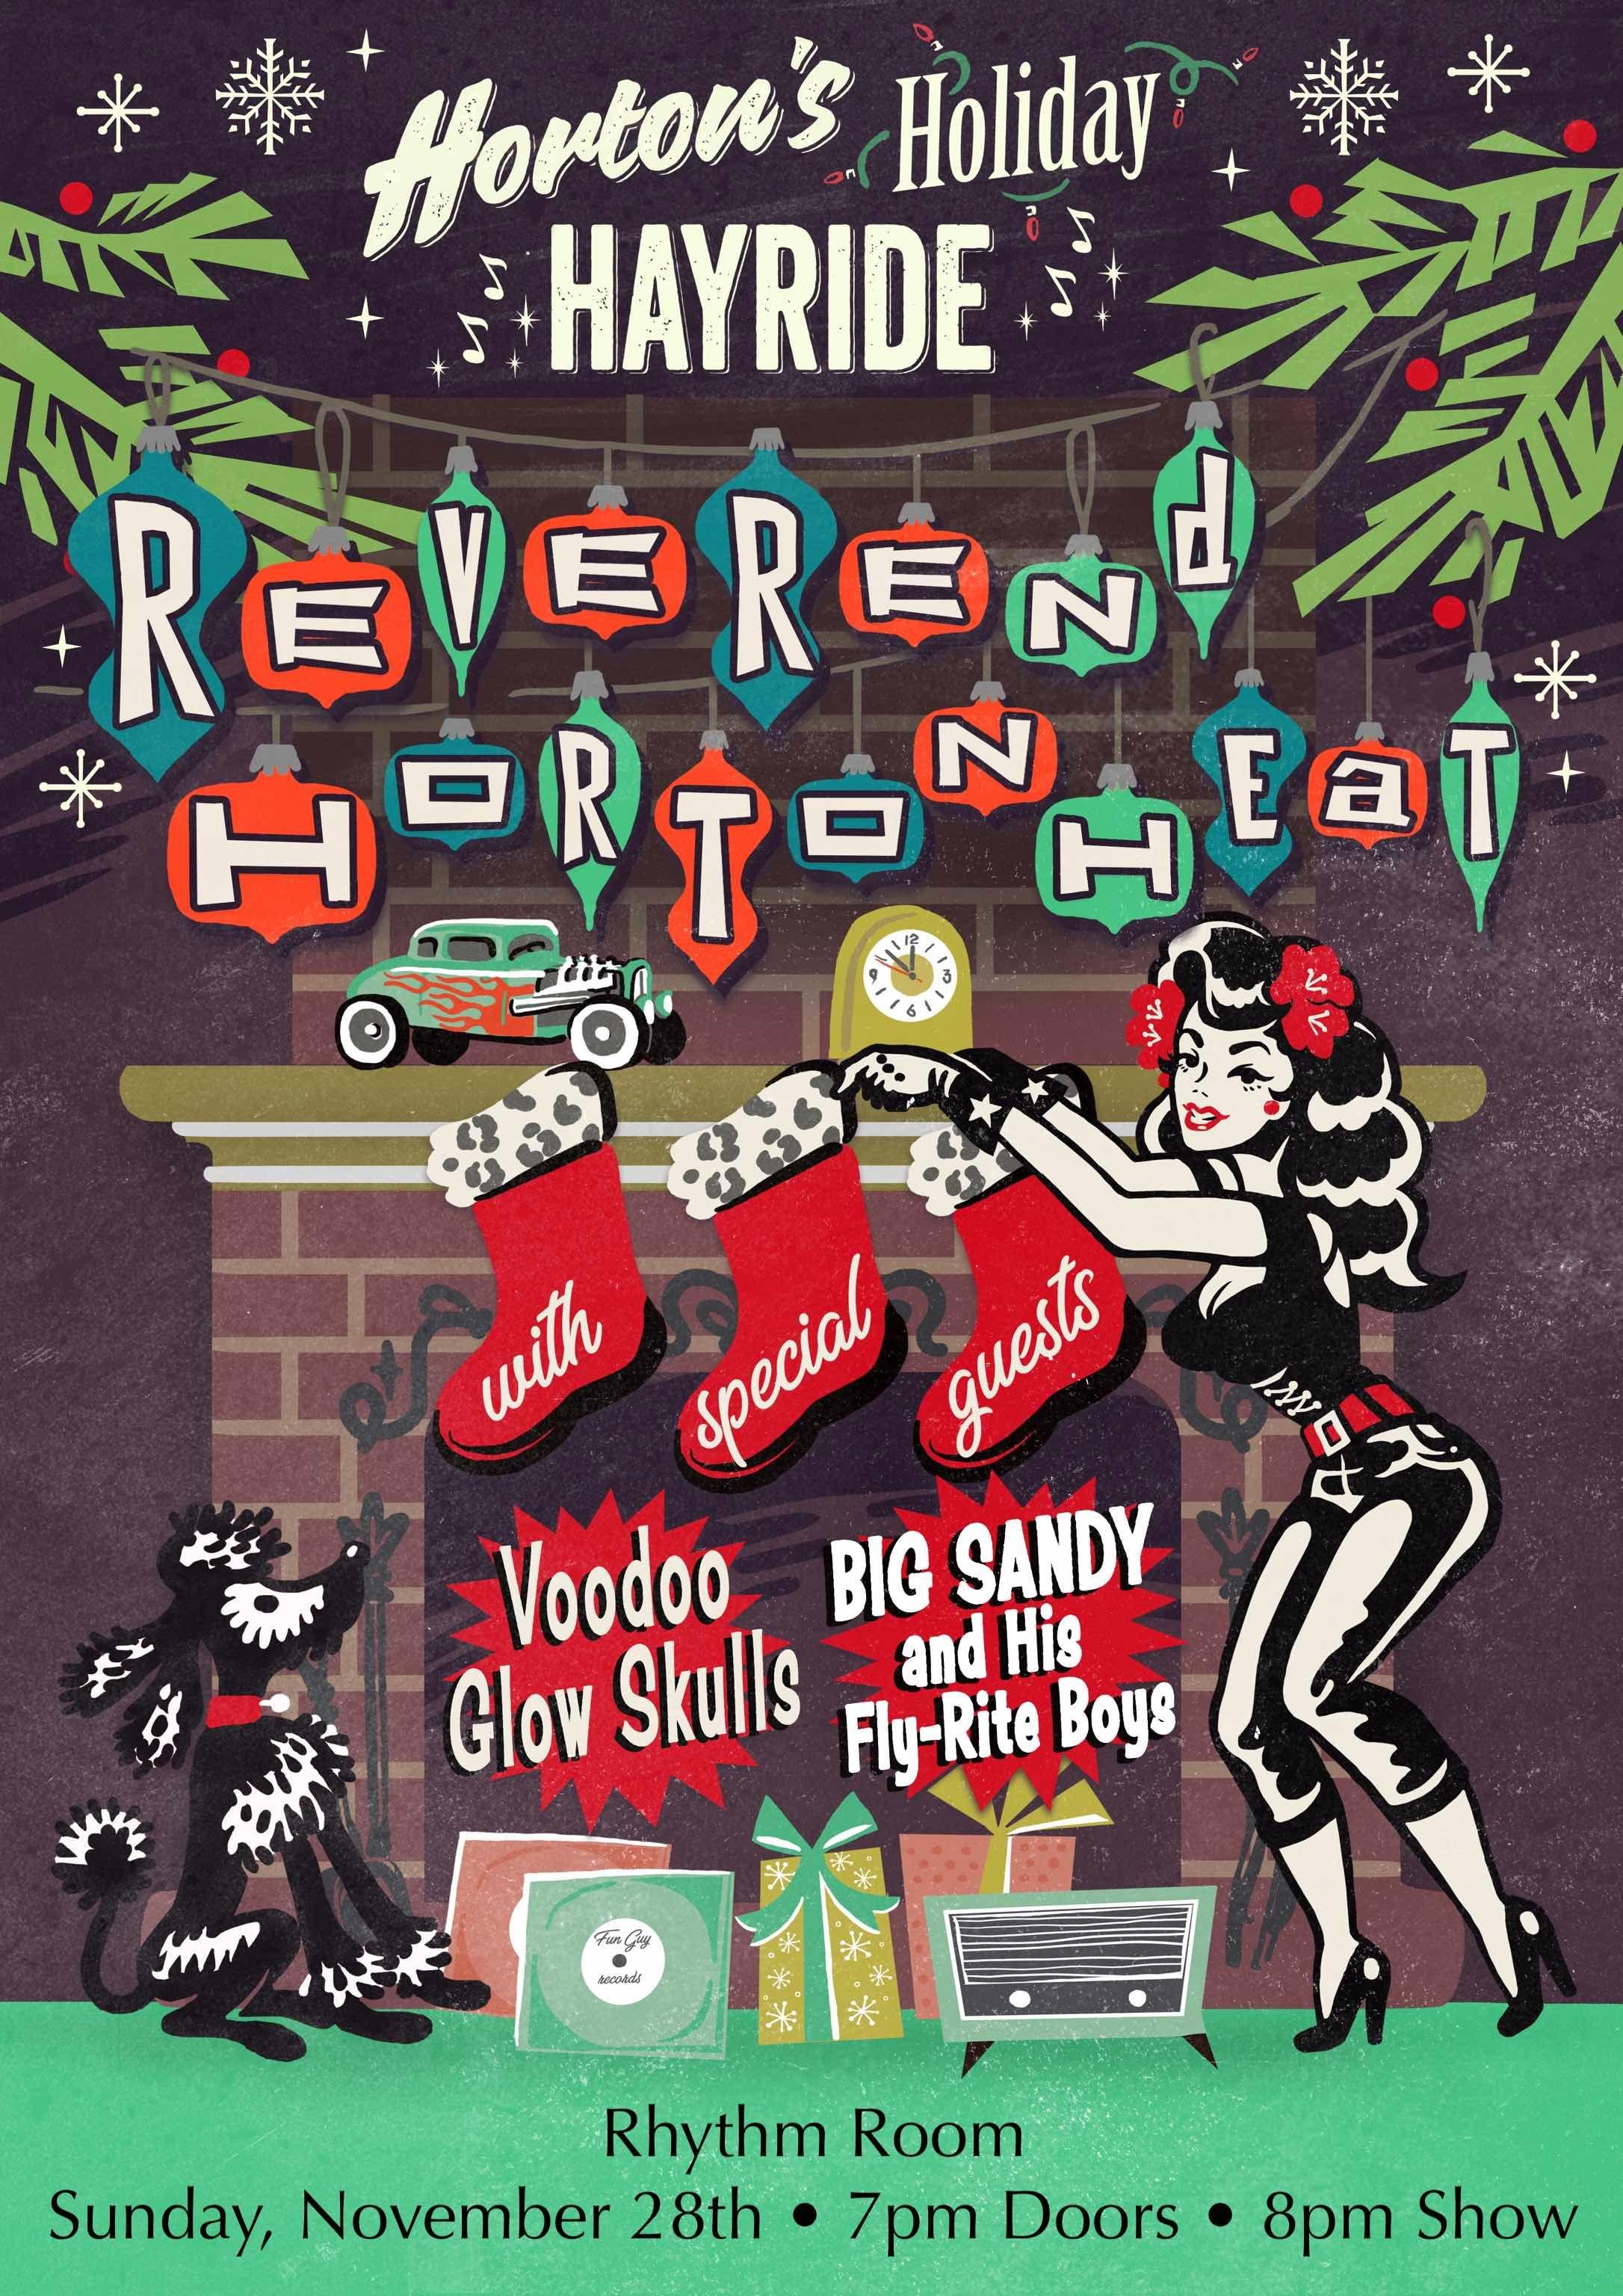 Horton's Holiday Hayride w/ Reverend Horton Heat: